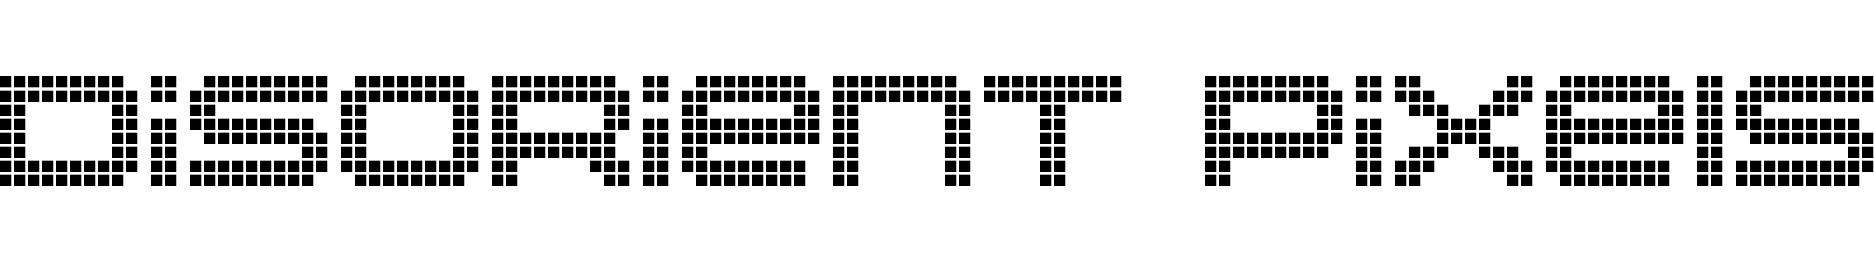 Disorient Pixels